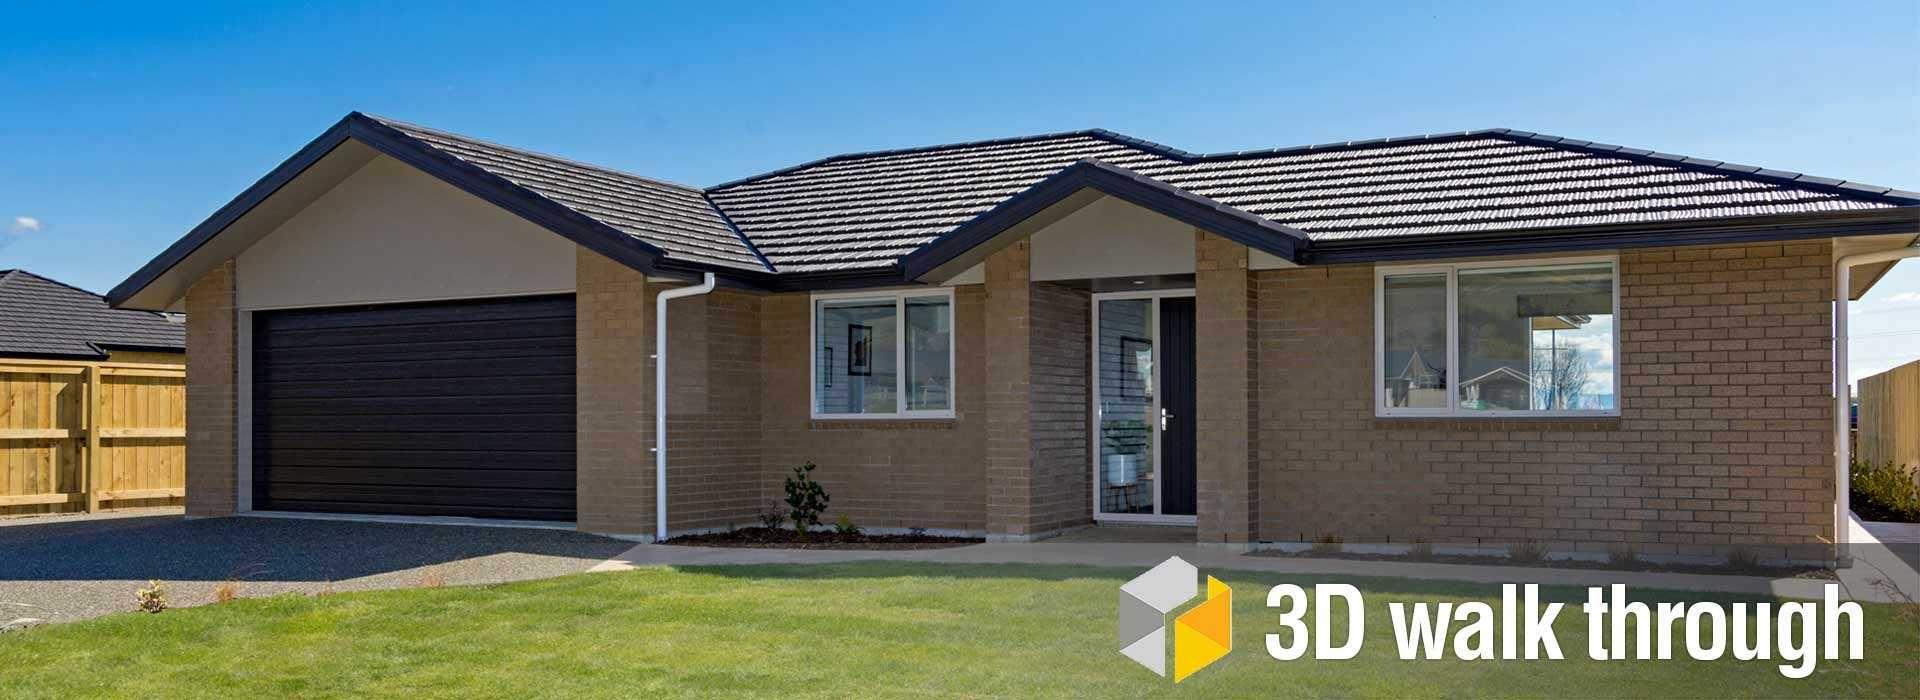 Nelson Showhome Kahu Signature Homes Show home